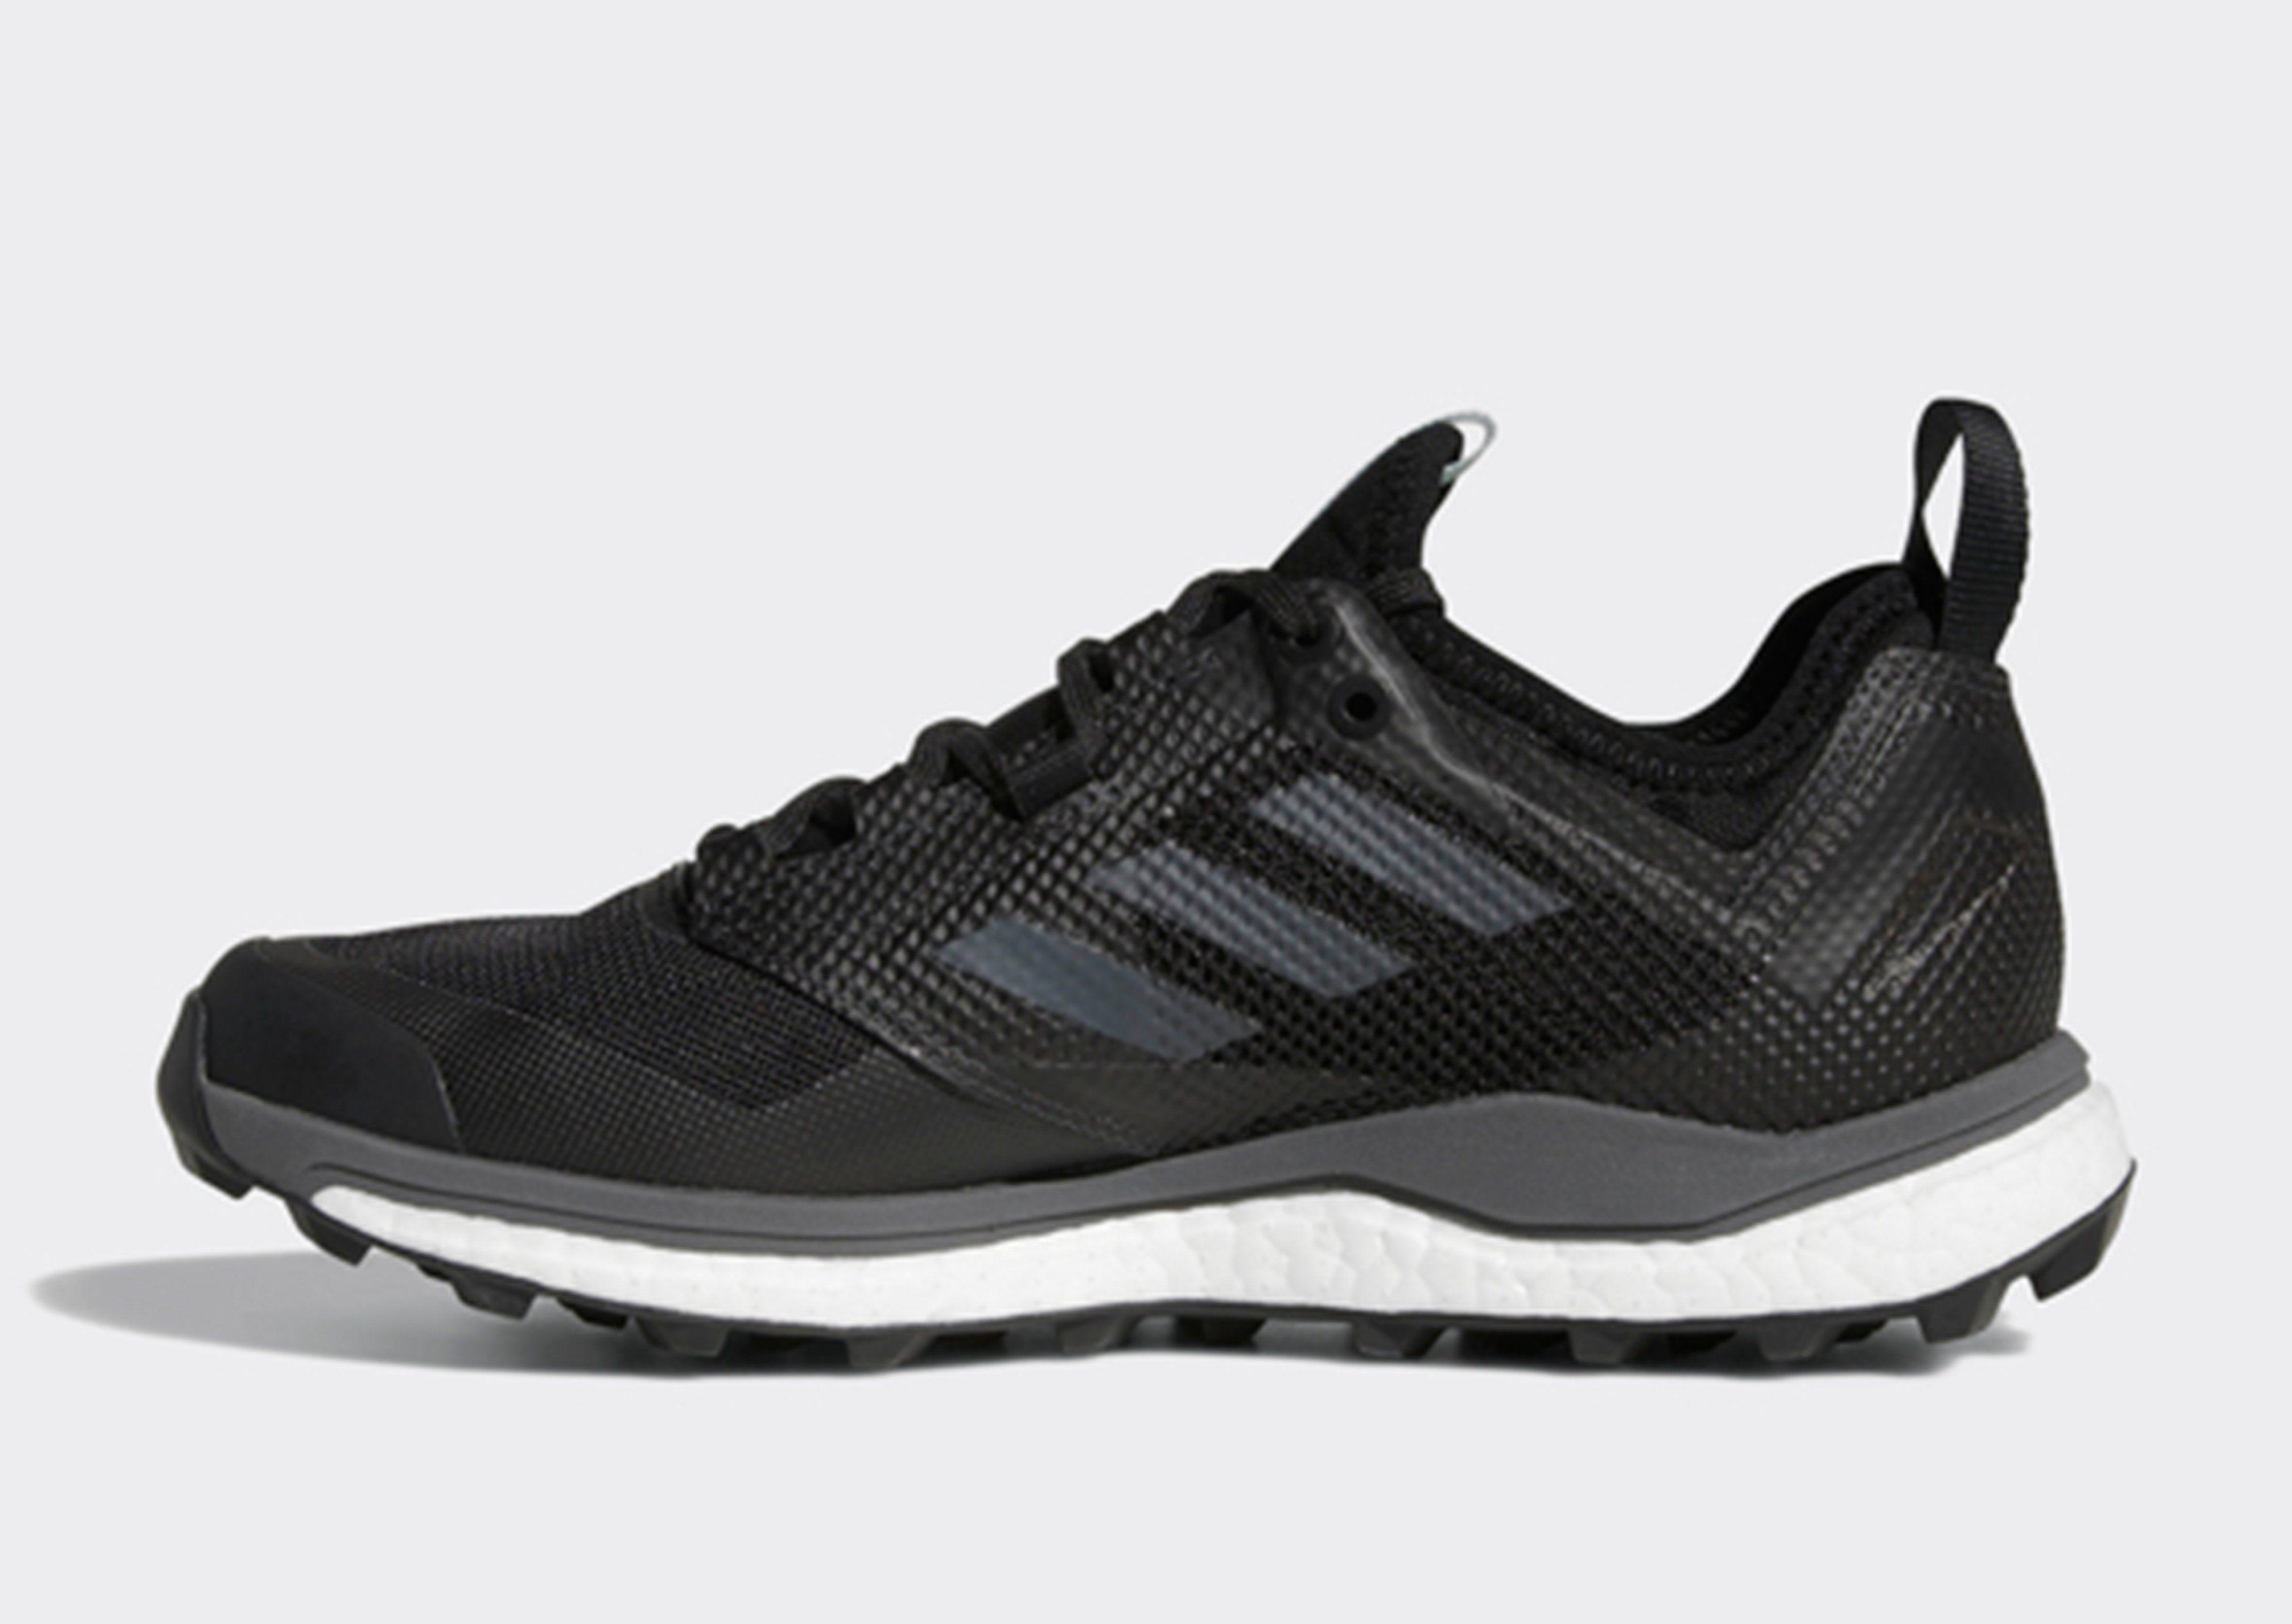 4f13c0fb0859 ADIDAS Terrex Agravic XT GTX Shoes